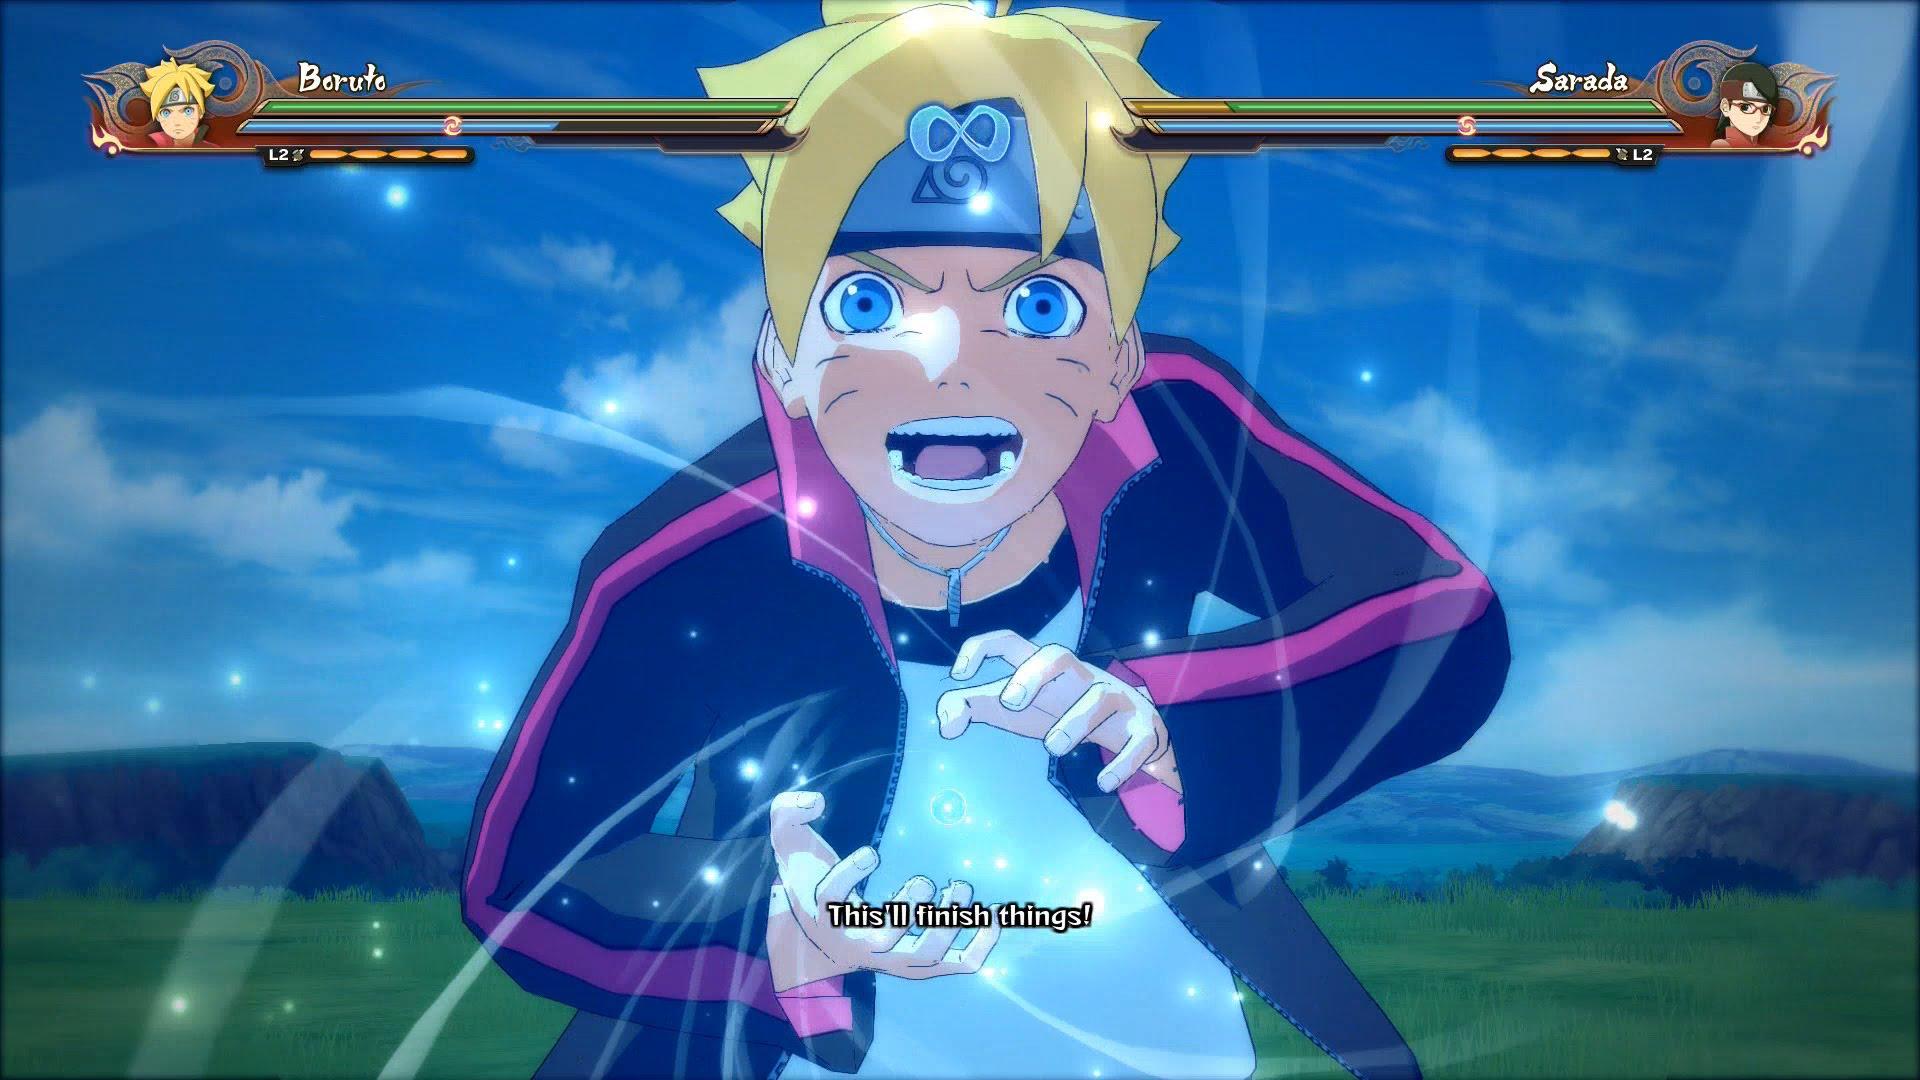 Naruto Shippuden Ultimate Ninja Storm 4 - All Ultimate